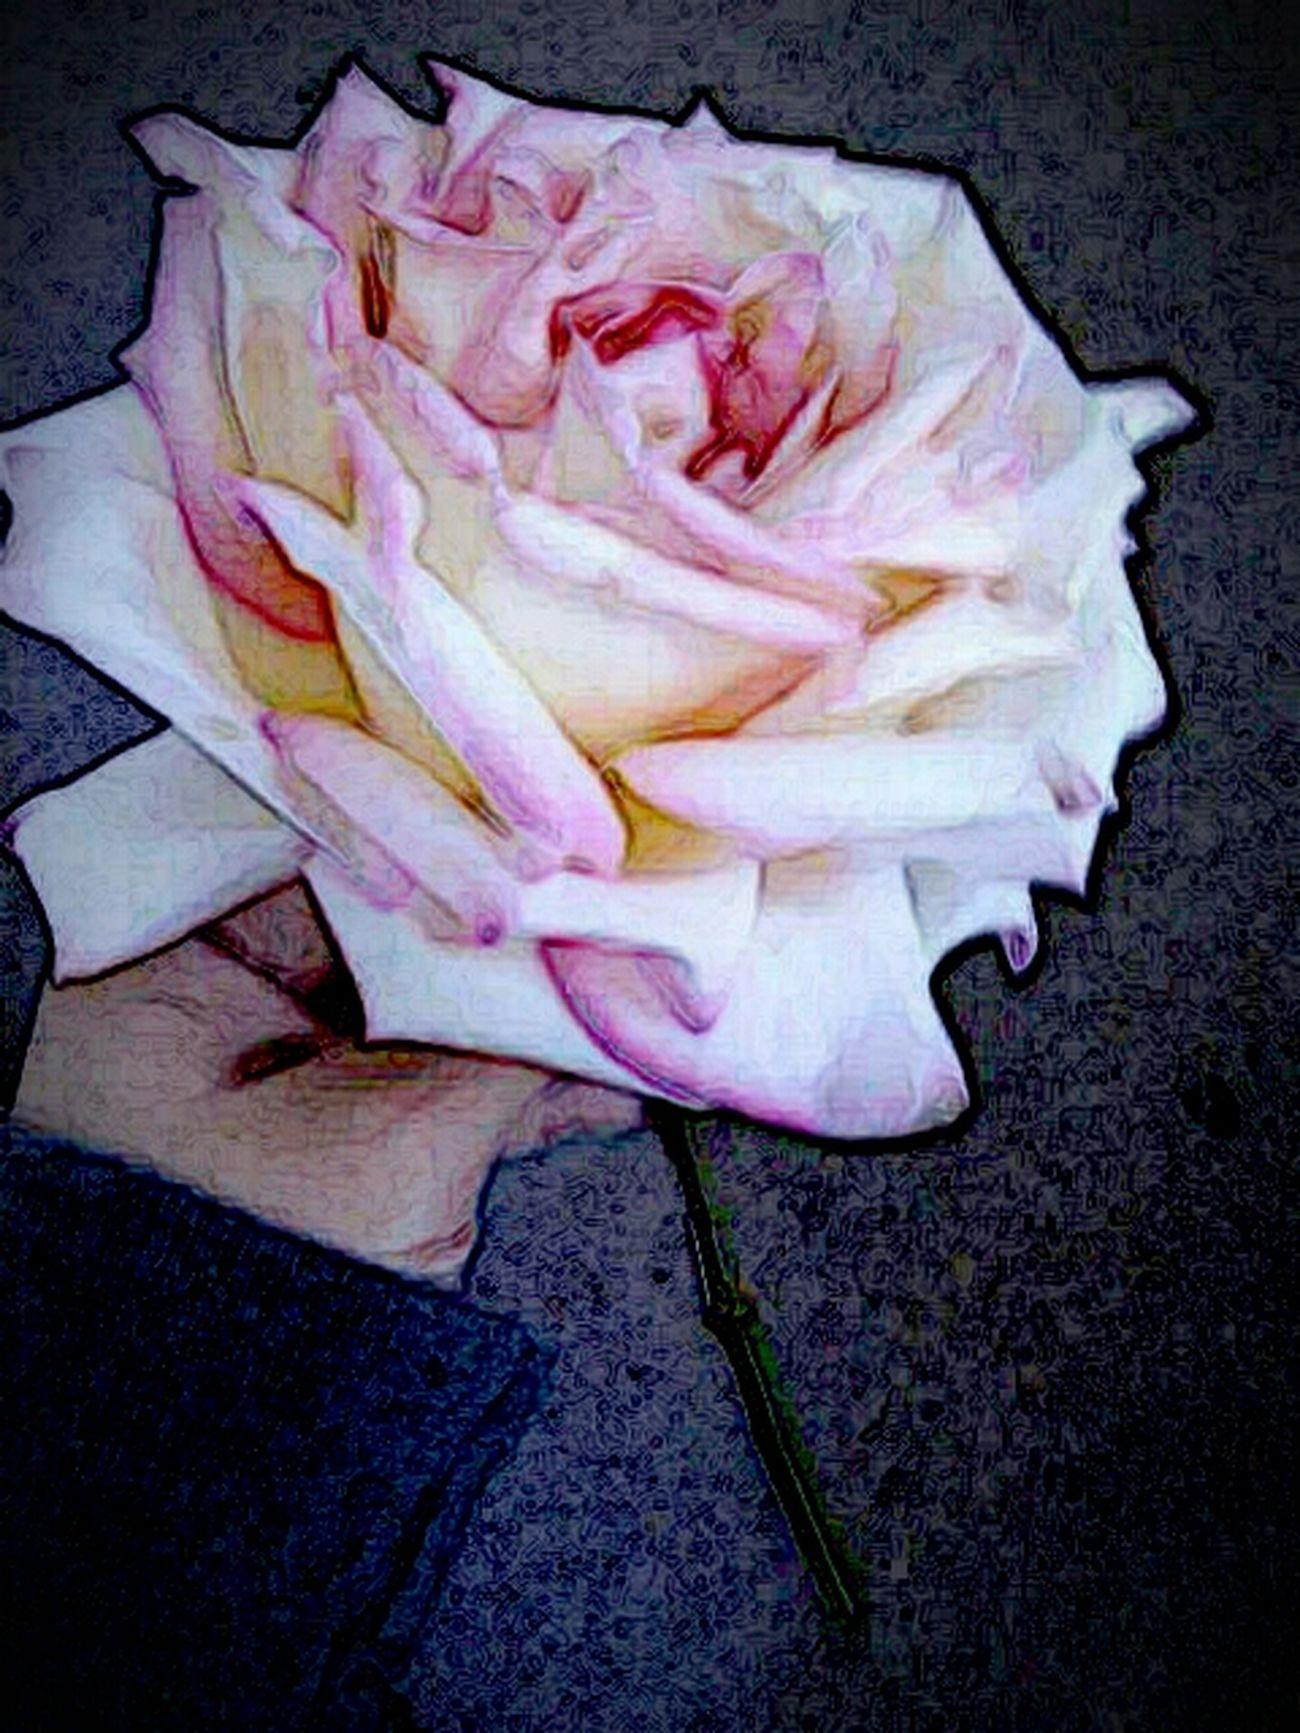 Flower Rose♥ Pretty Rose